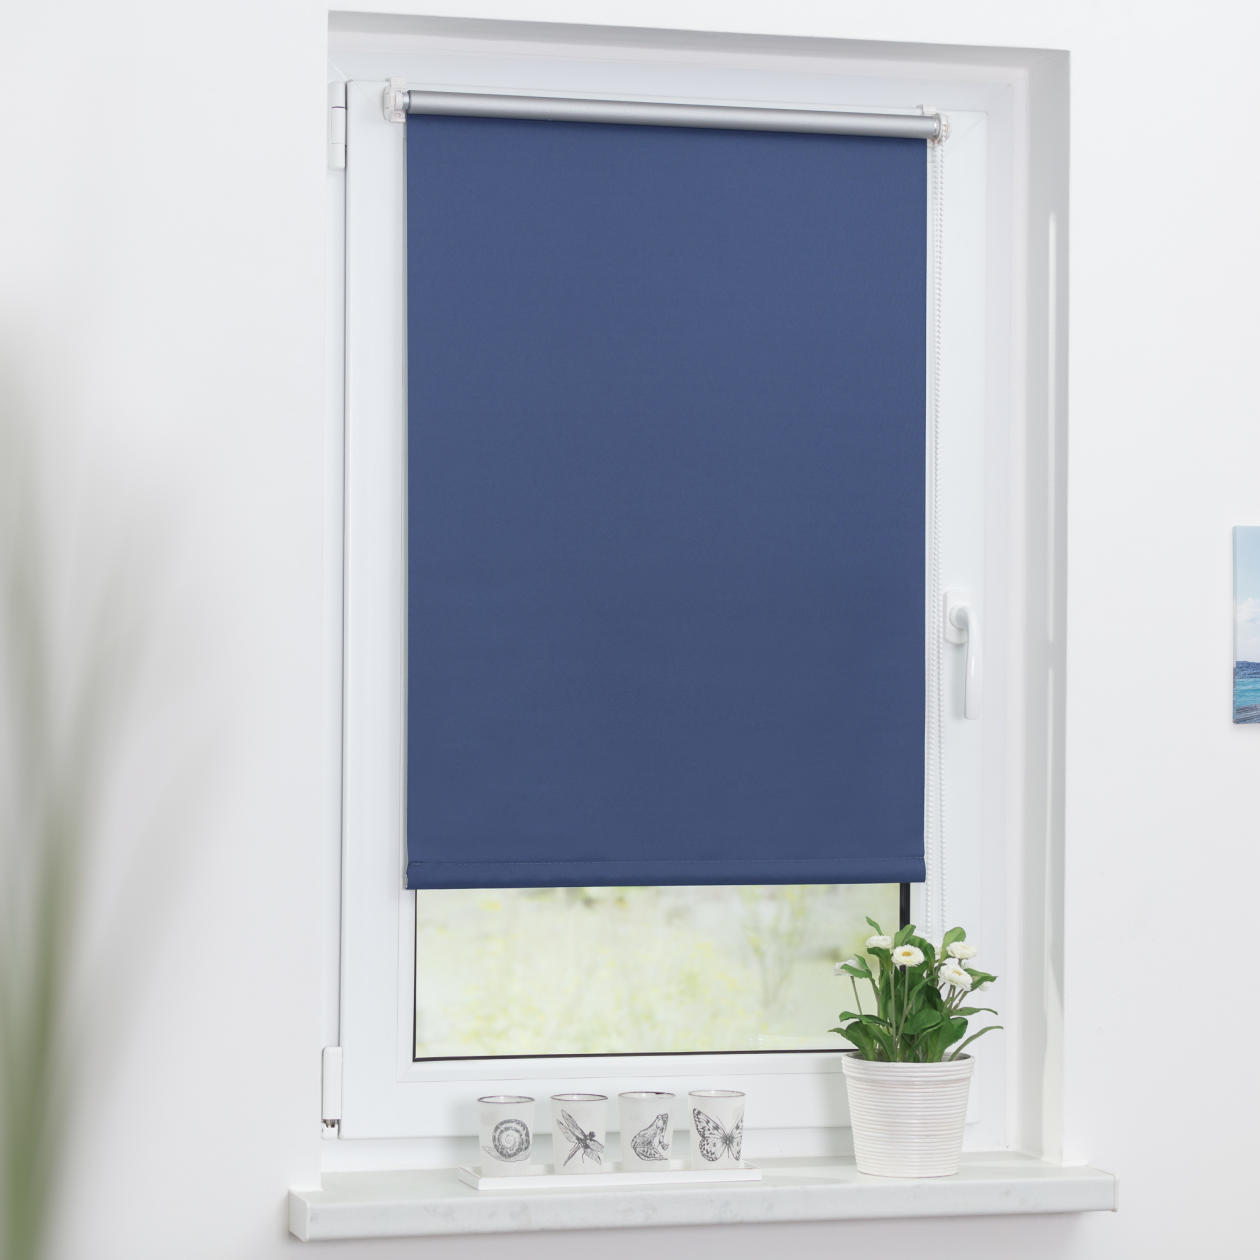 thermo rollo verdunkelungsrollo klemmfix ohne bohren lichblick shop. Black Bedroom Furniture Sets. Home Design Ideas